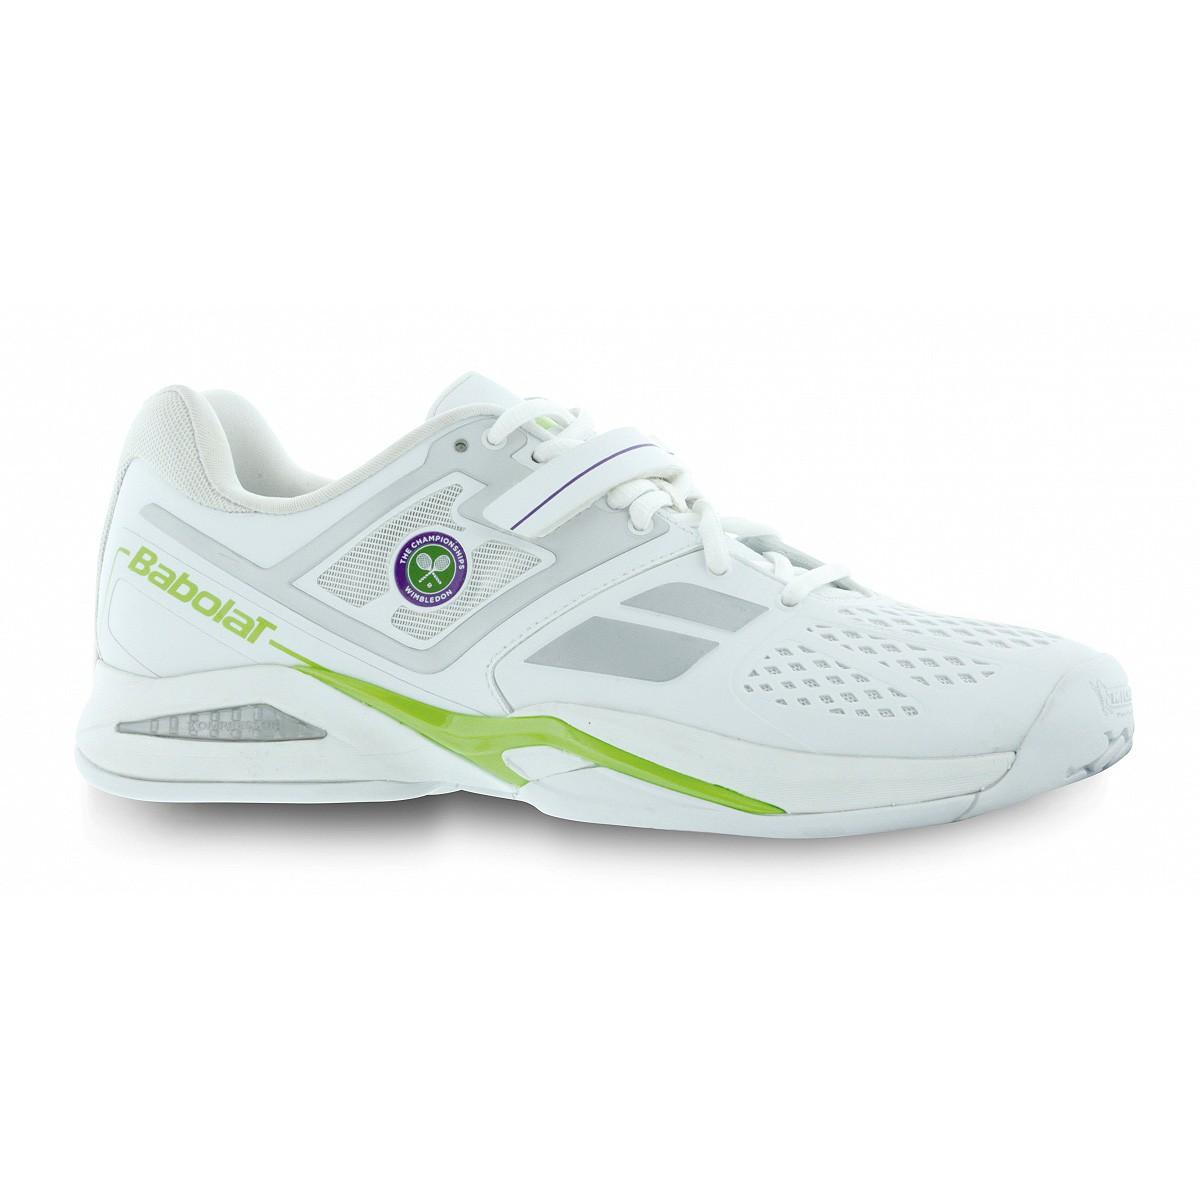 Buty tenisowe Babolat Propulse BPM All Court Wimbledon - Wyprzedaż!